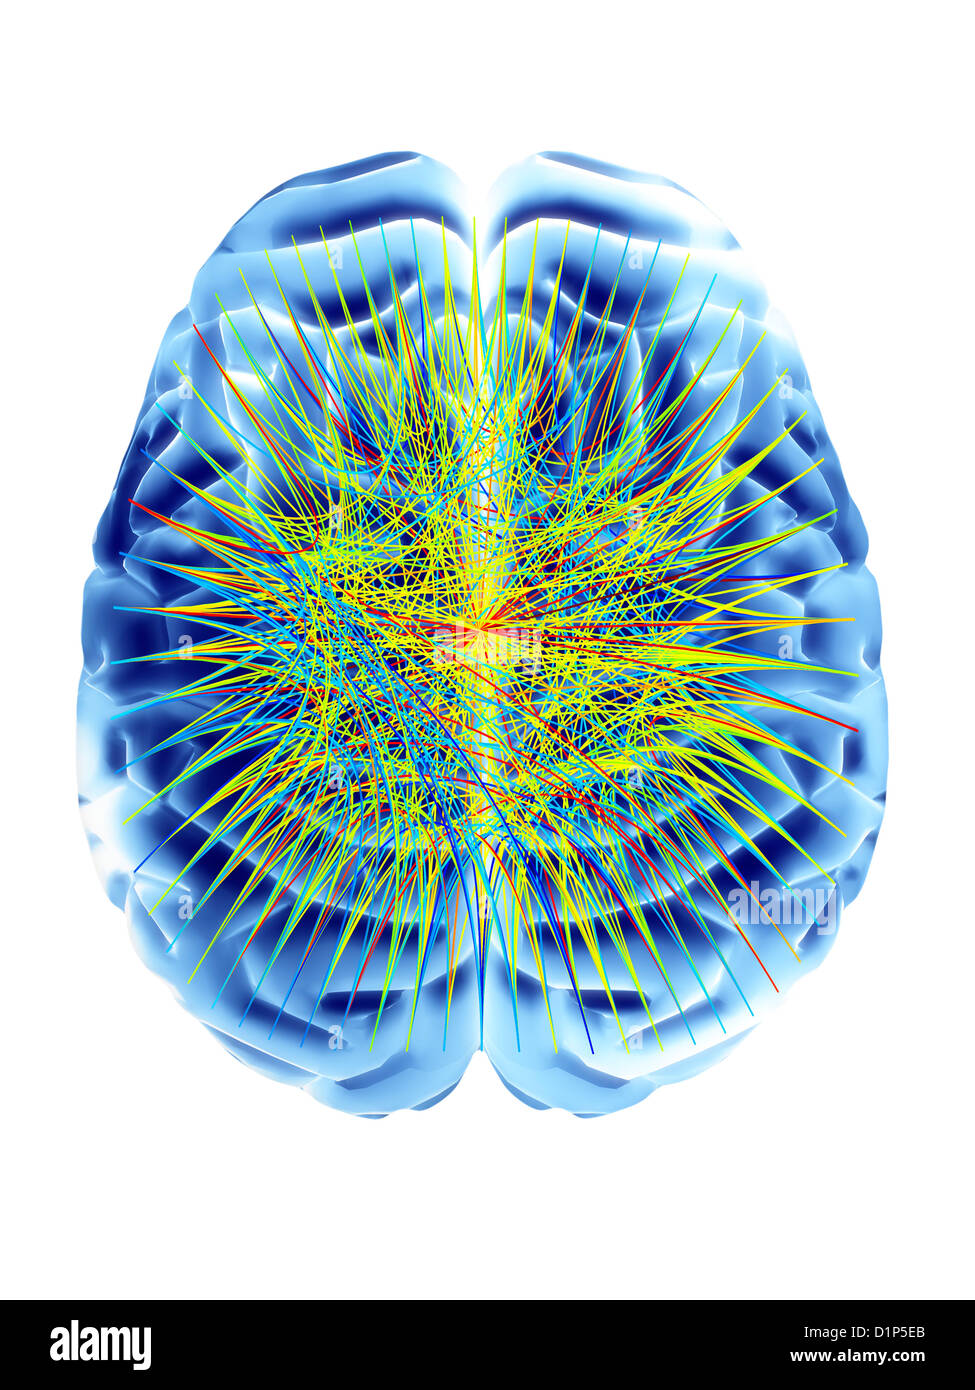 Brain And Circular Network Diagram Stock Photo Royalty Free Image